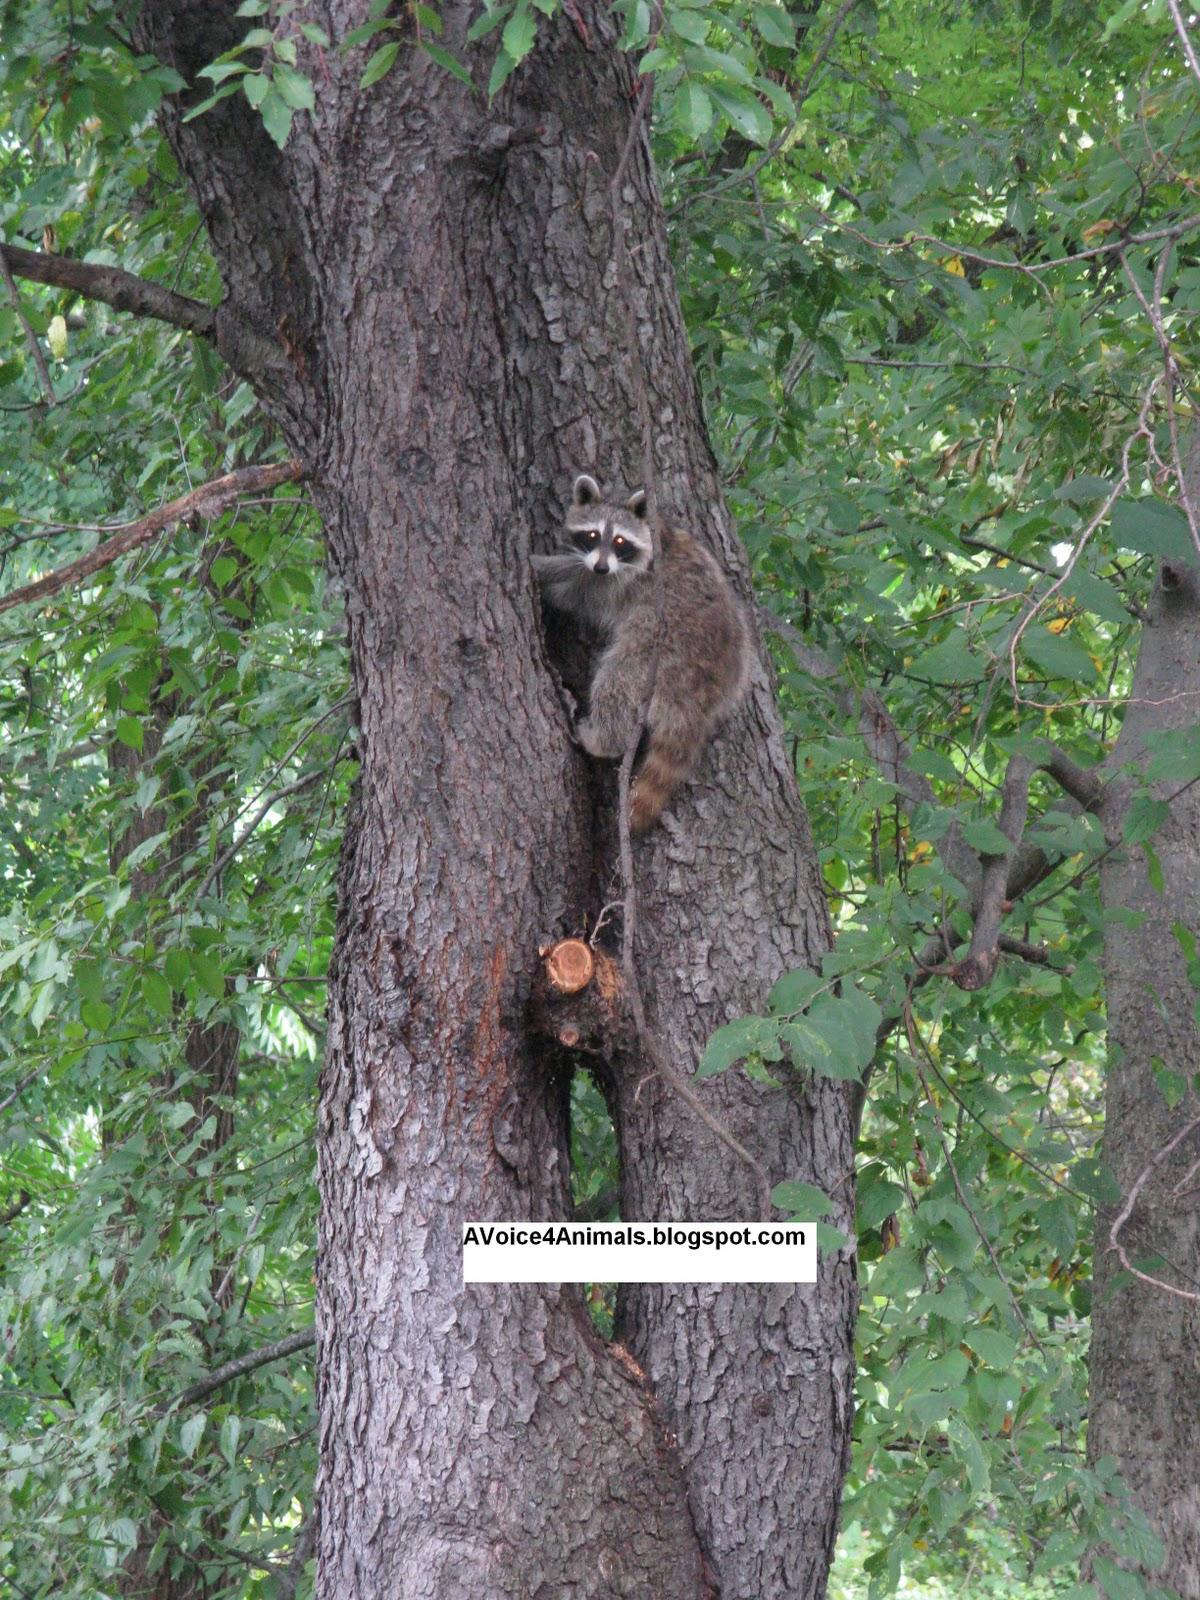 Voice 4 Animals Backyard Wildlife Series  Raccoon